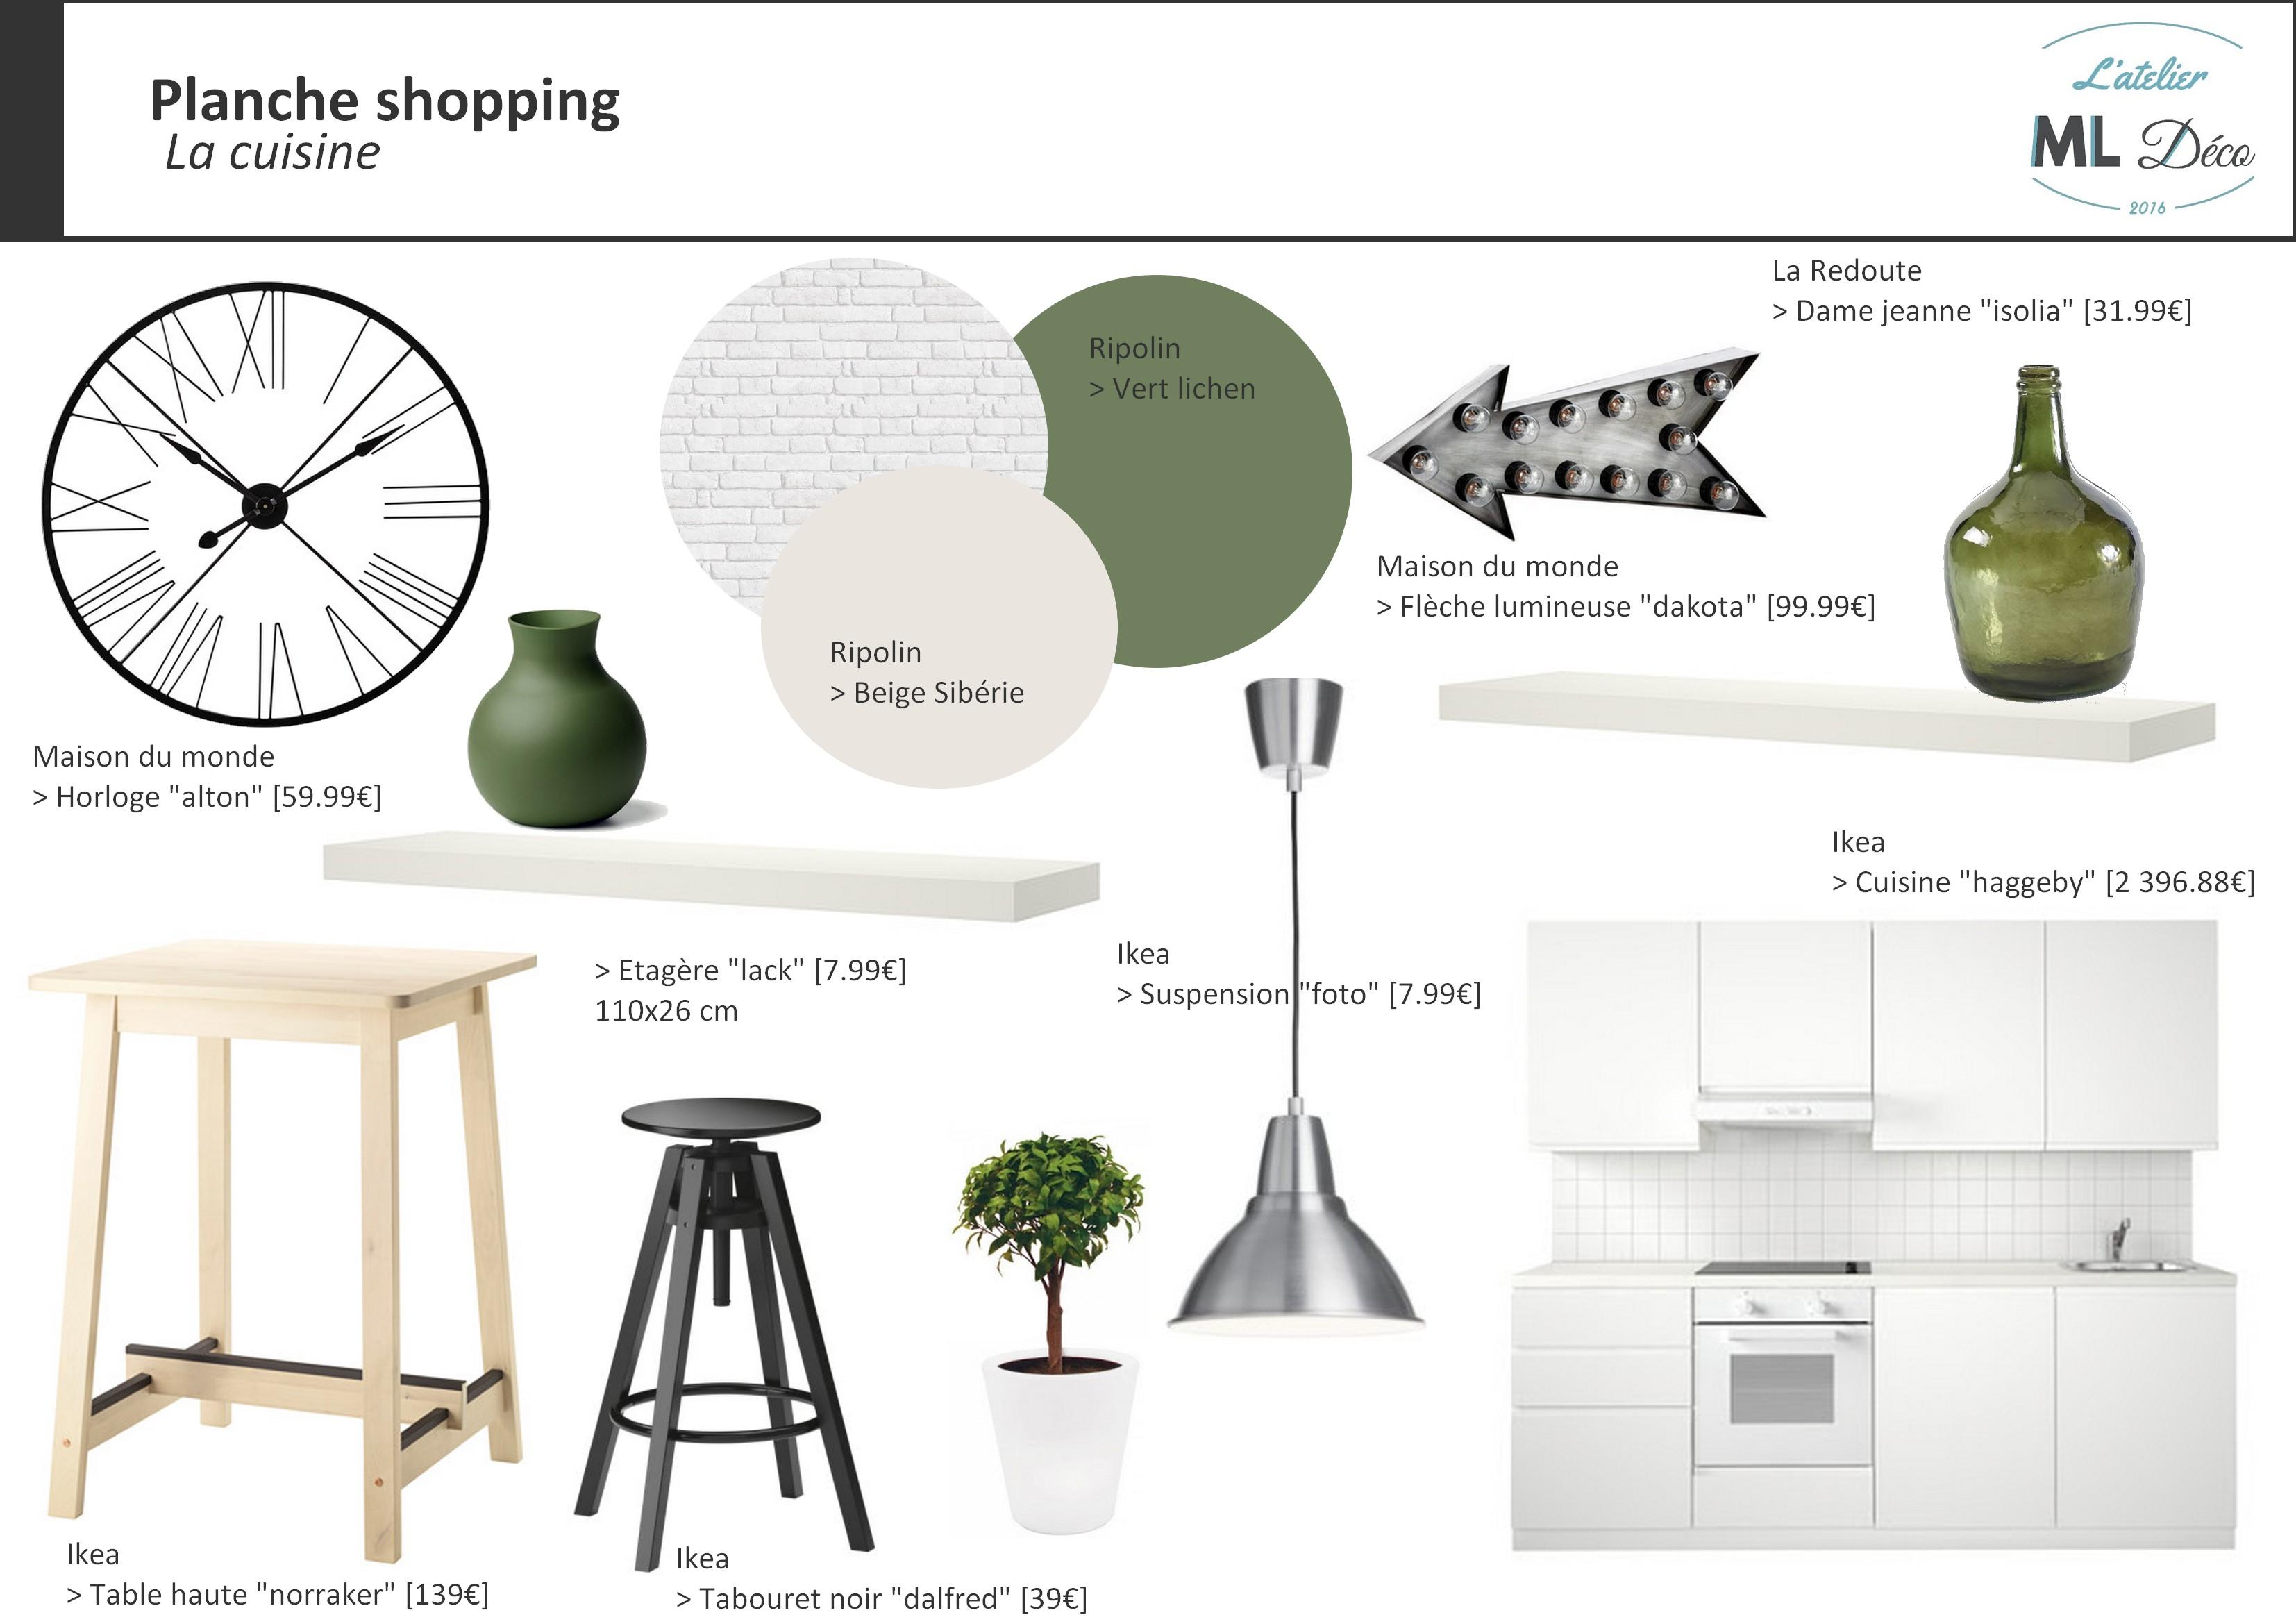 Planche shopping - La cuisine.jpg